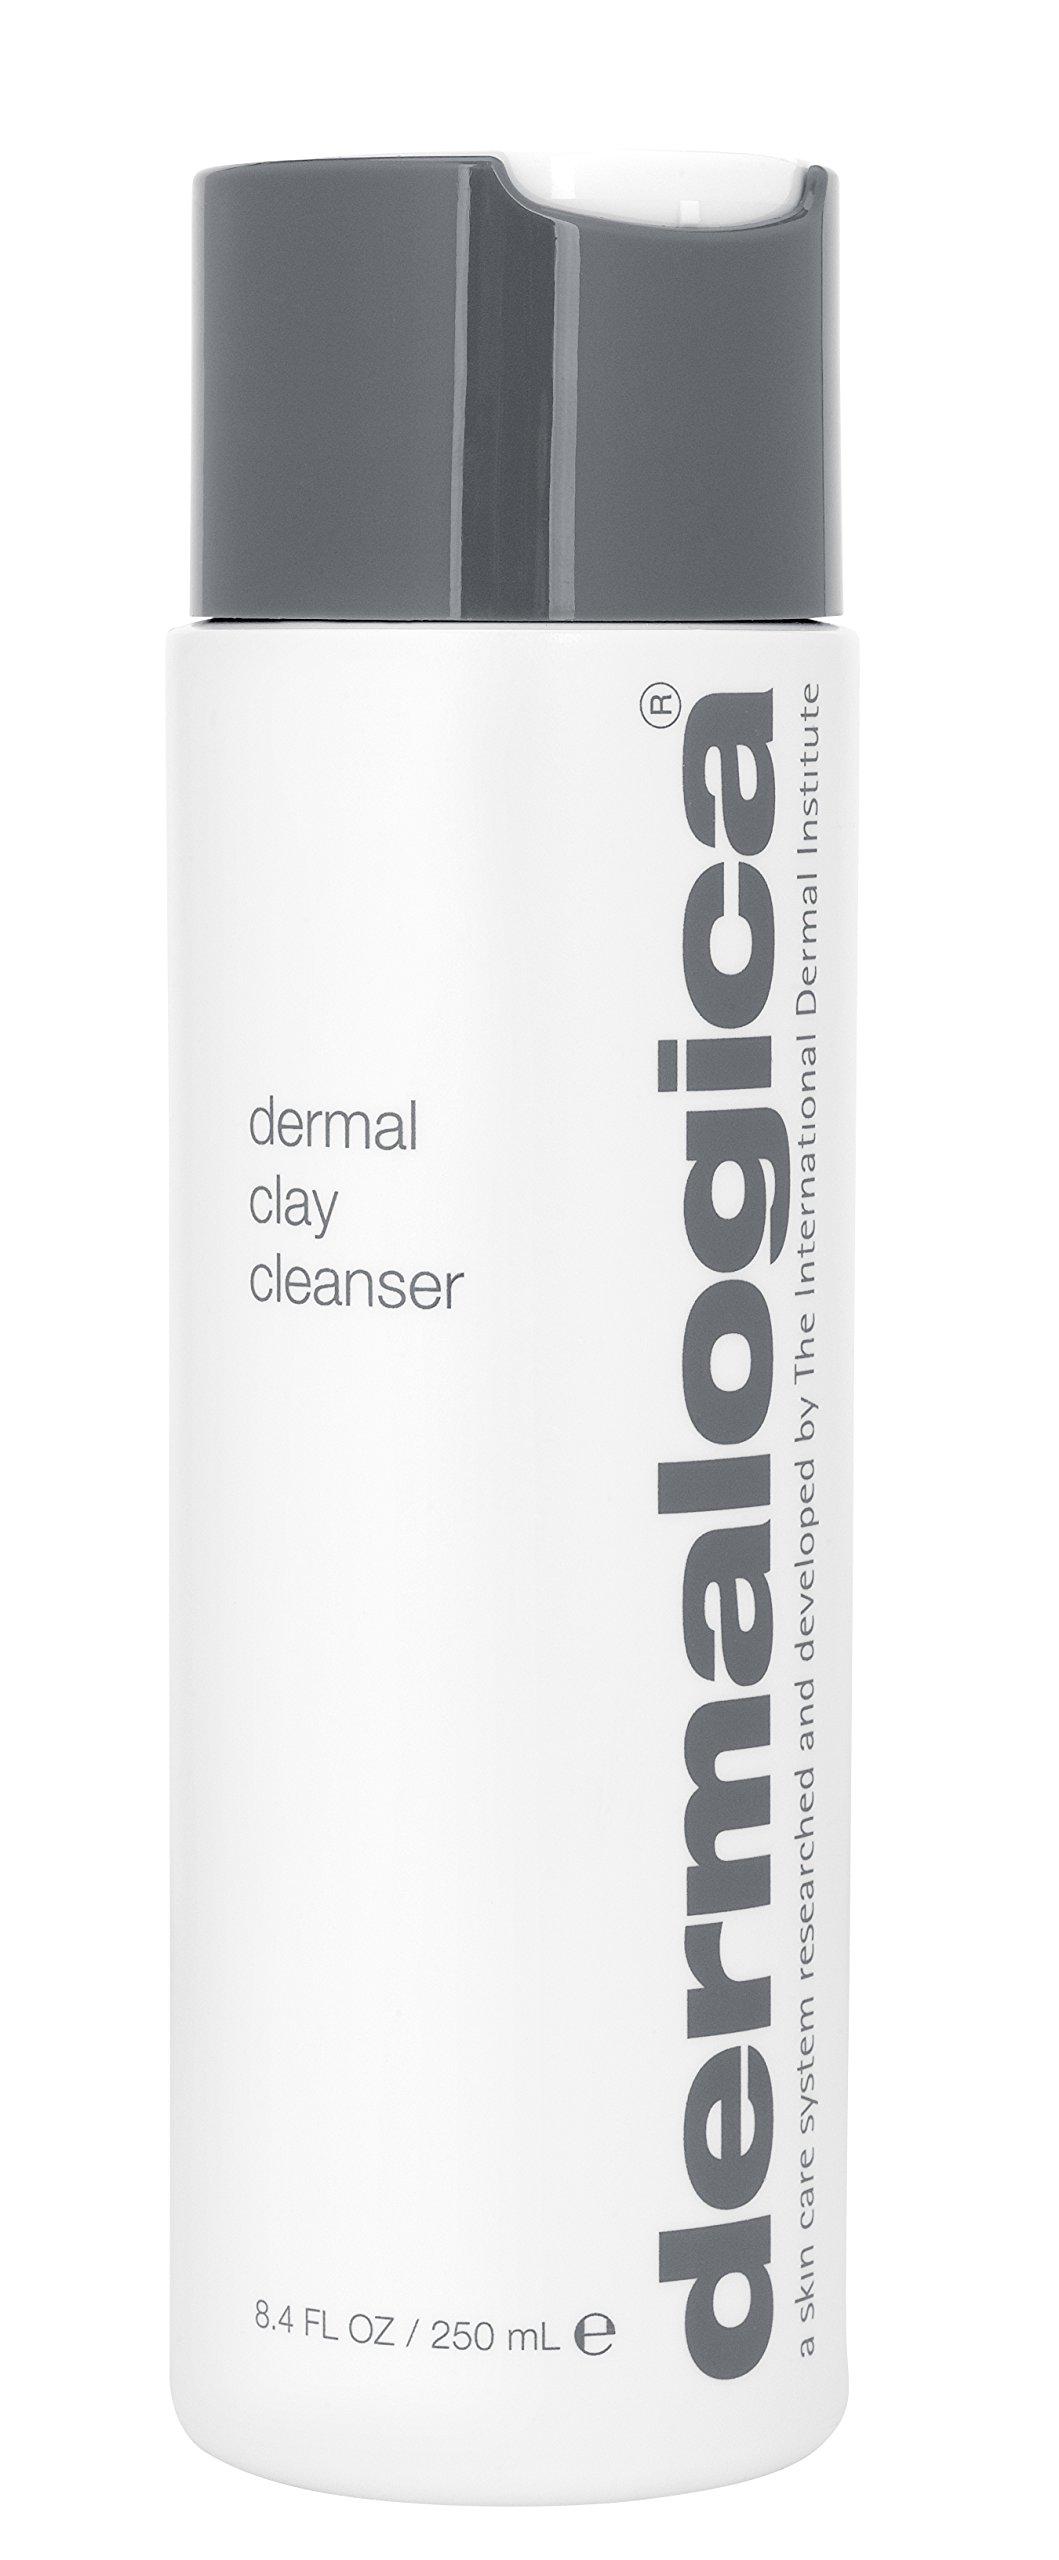 Dermalogica Dermal Clay Cleanser, 8.4 Fl Oz